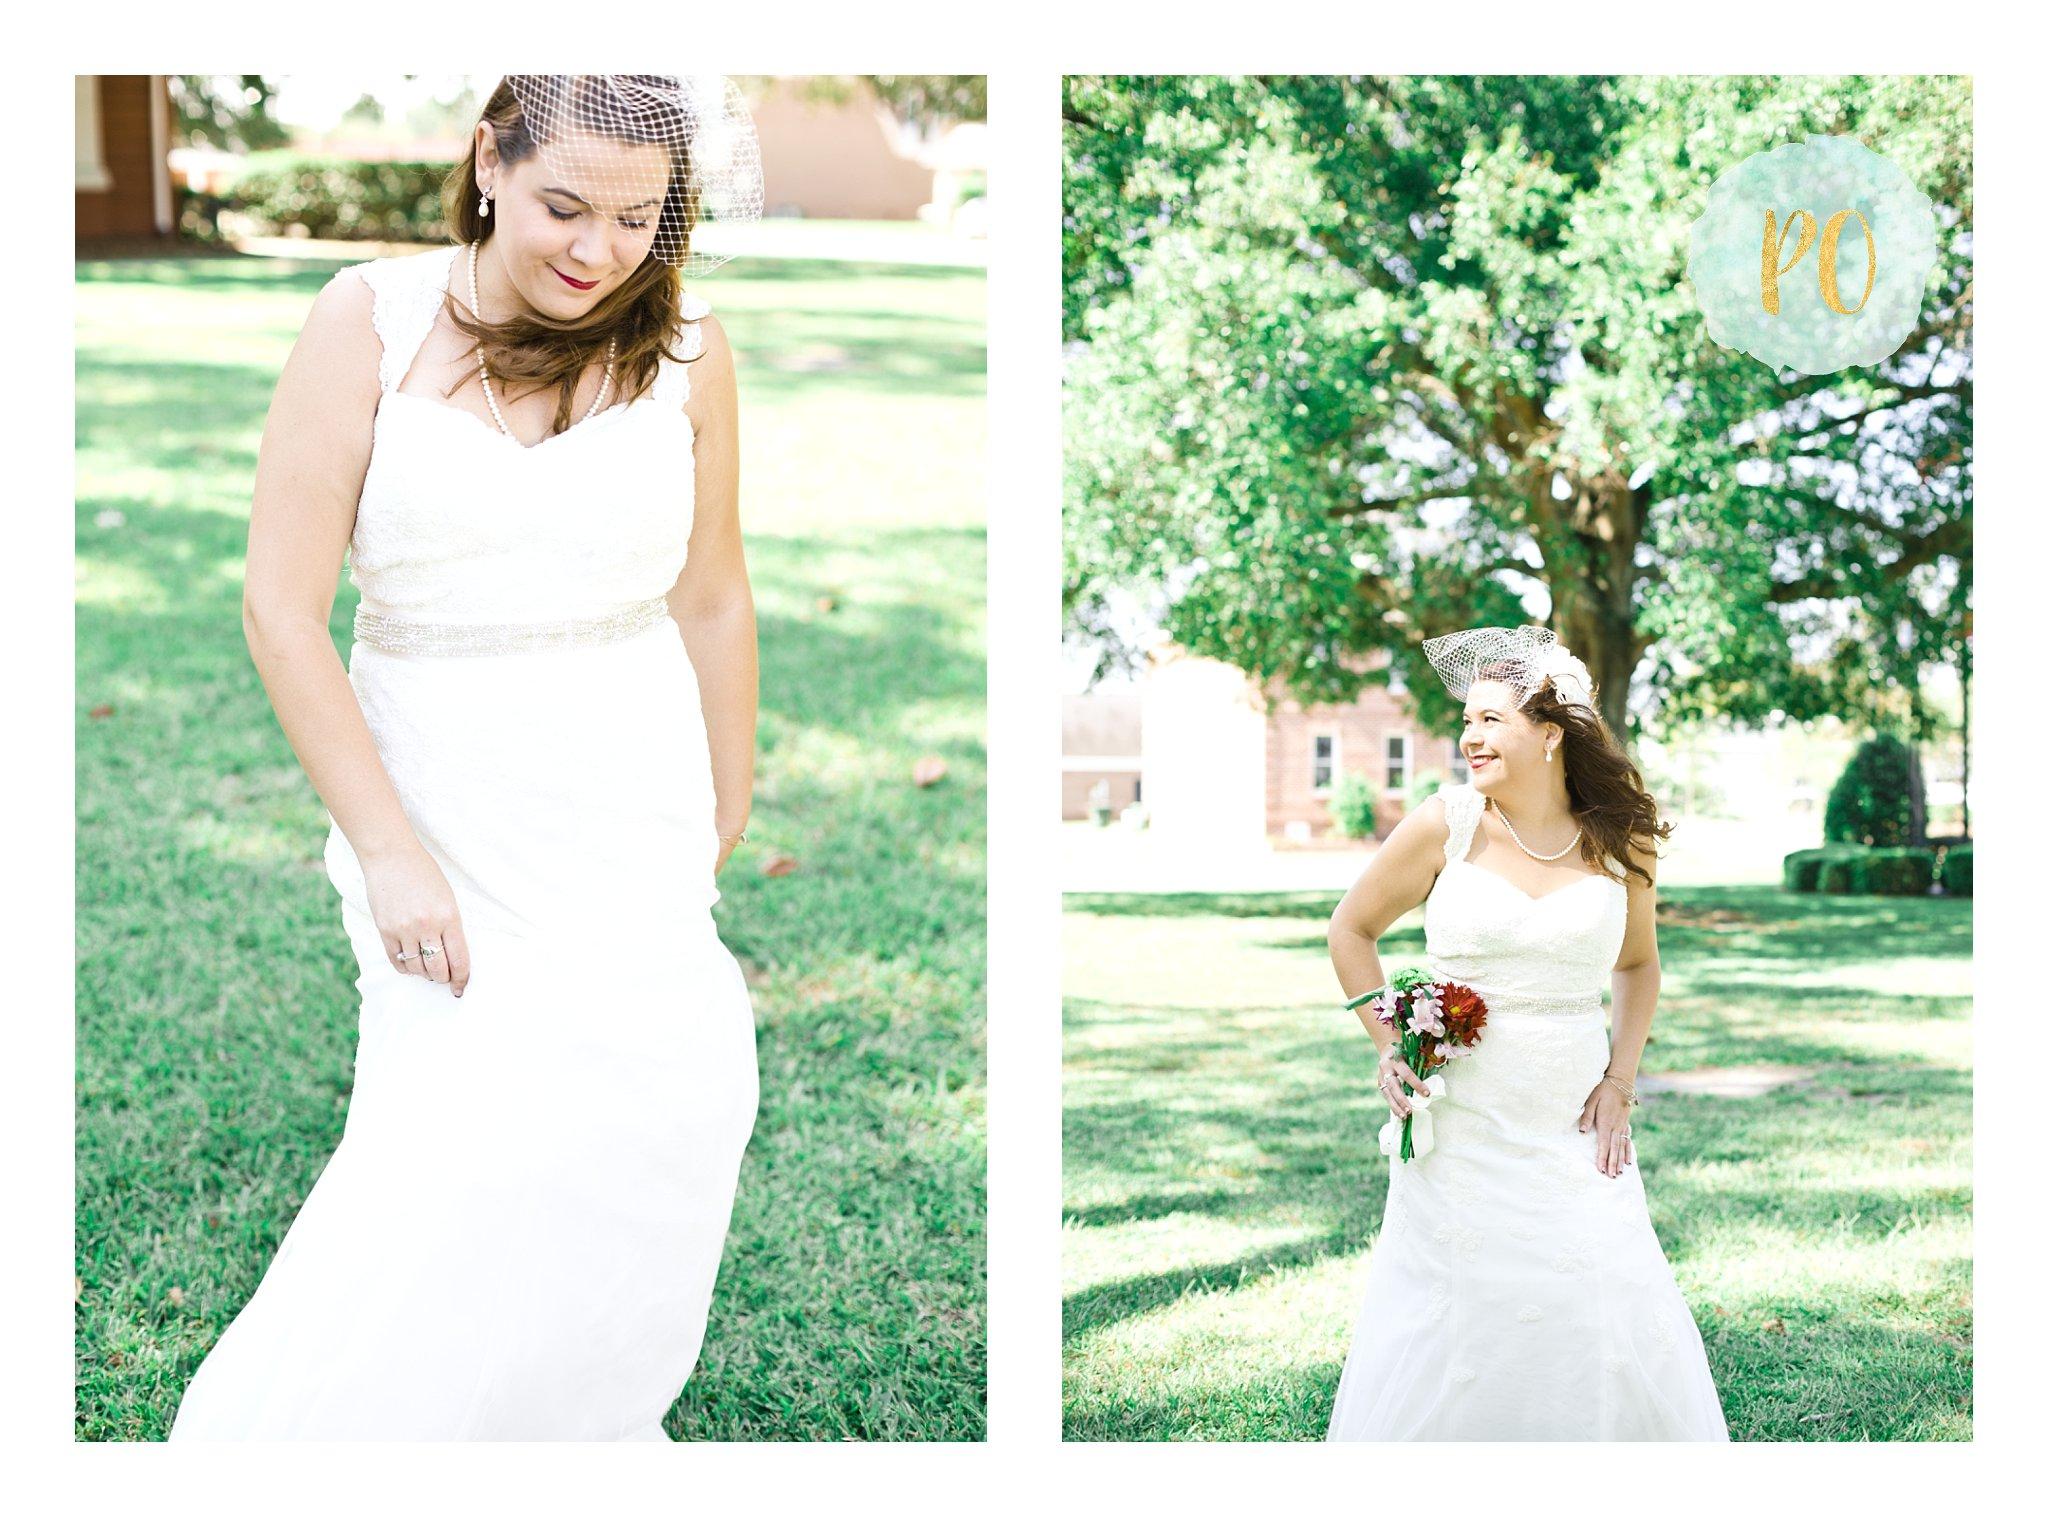 cypress-inn-lowcountry-bridal-session-conway-sc-photos_0149.jpg